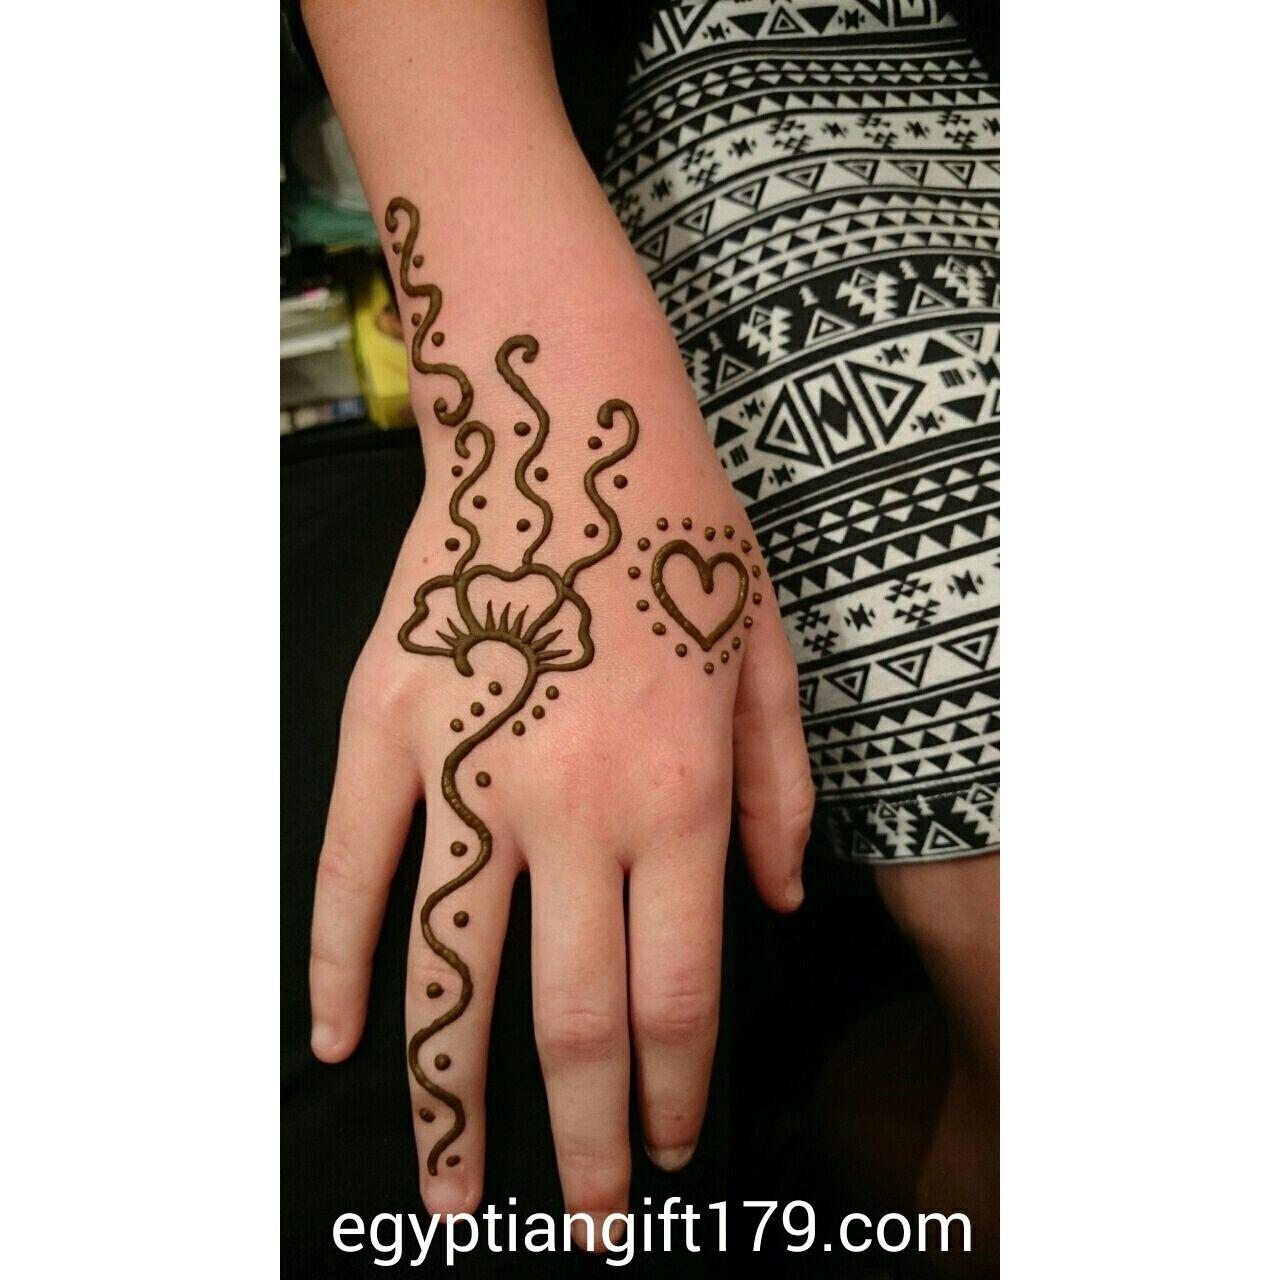 Egyptian Gift Corner Tattoo near me, Henna tattoo, Henna